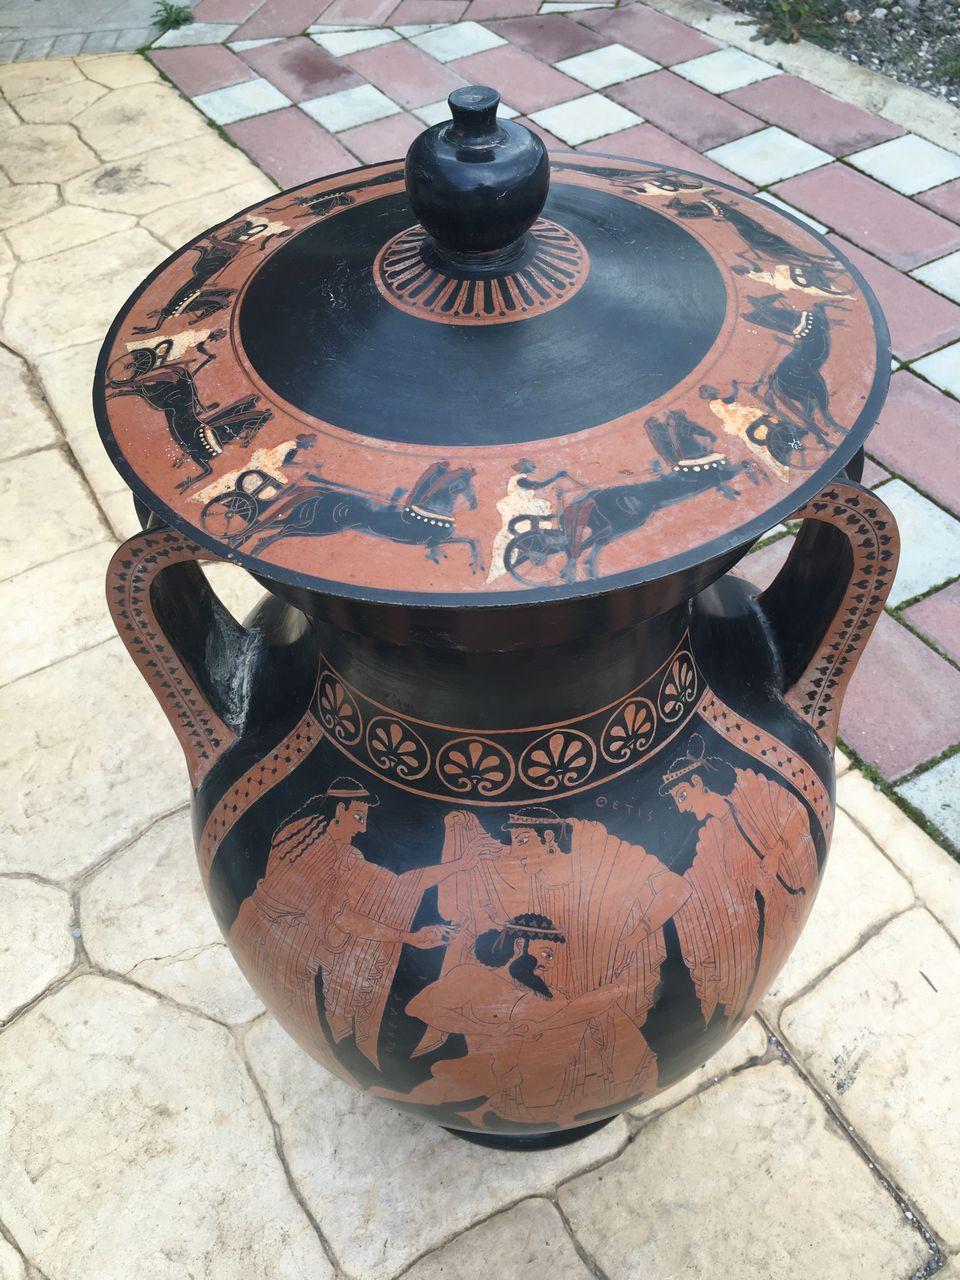 amphoreas ceramic pot made with the ancient technique